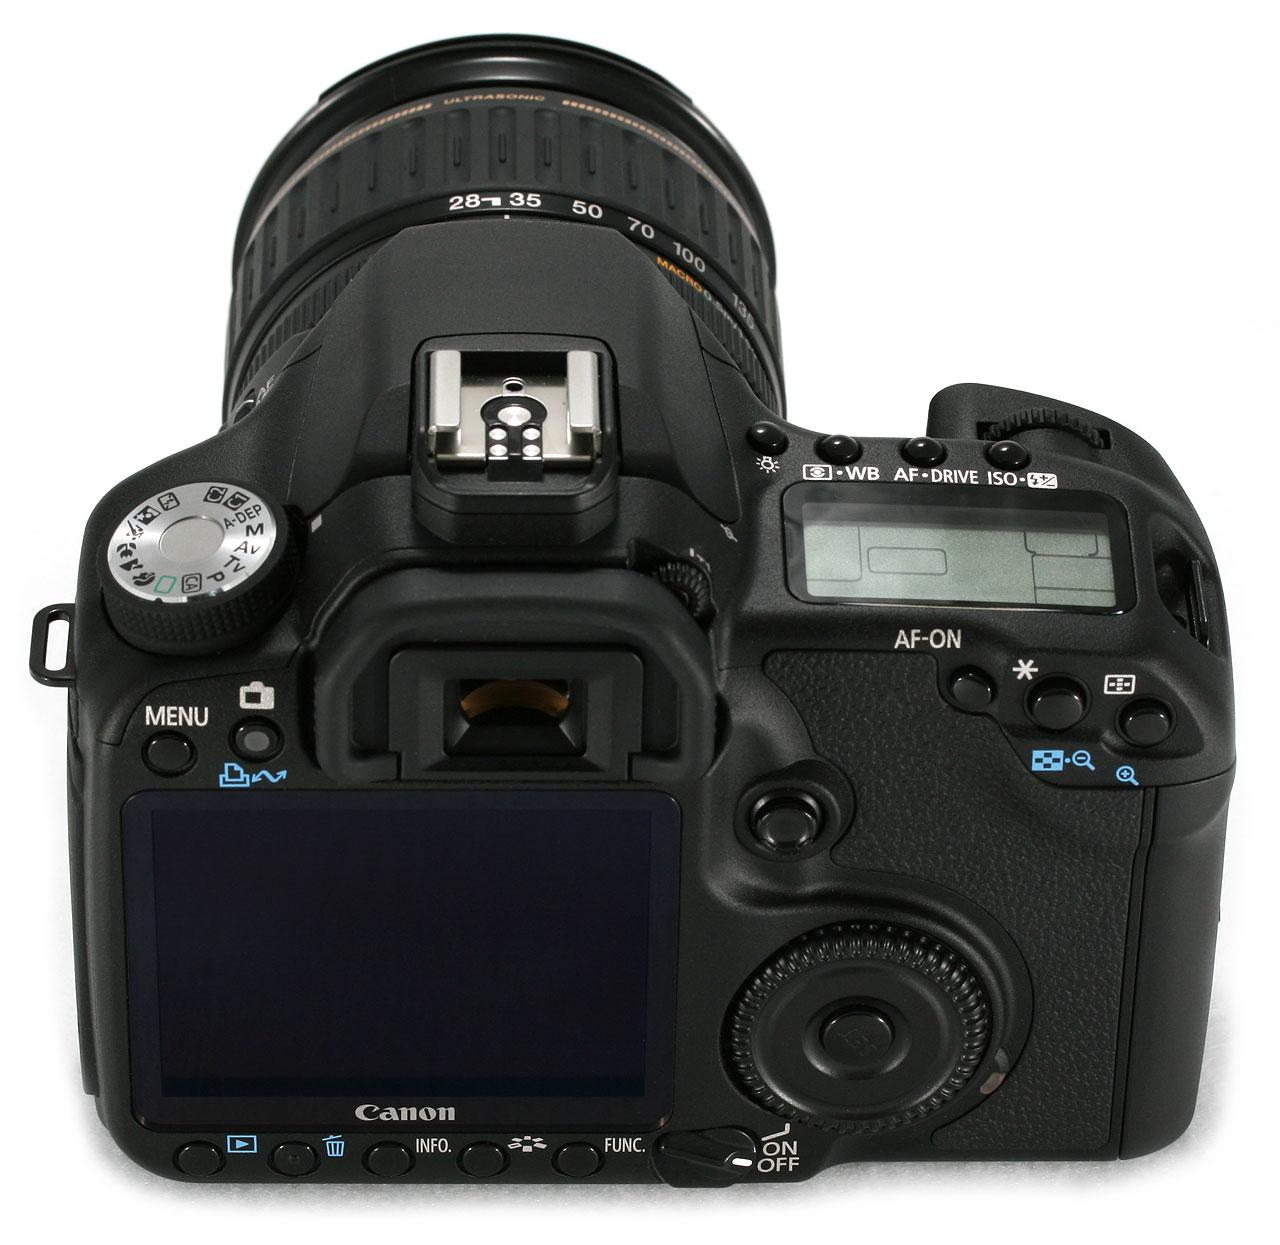 Canon EOS 50D DSLR Camera Technical Specs